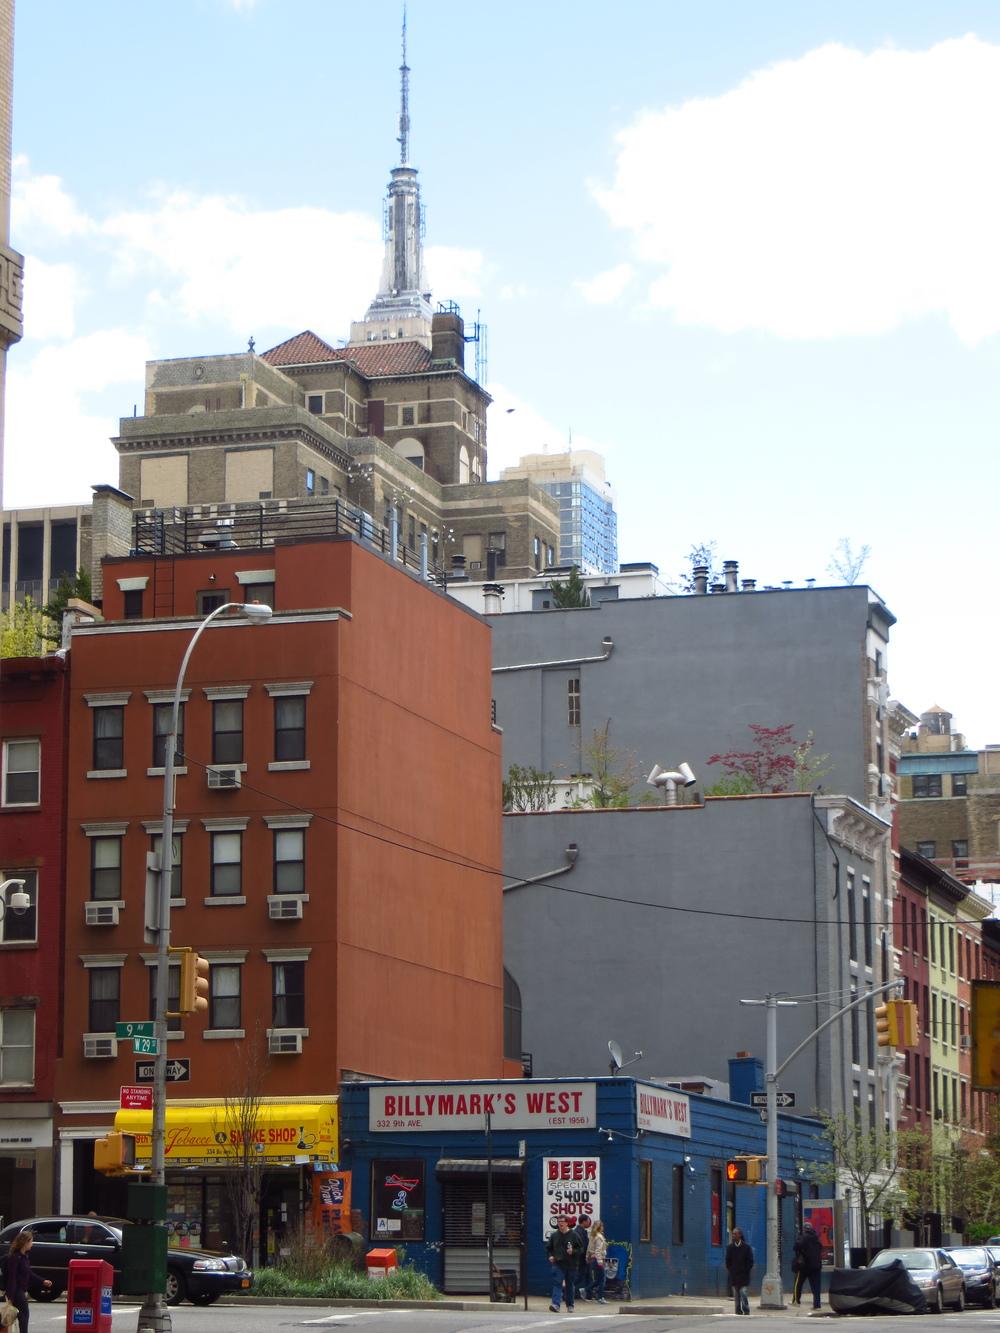 North Chelsea street